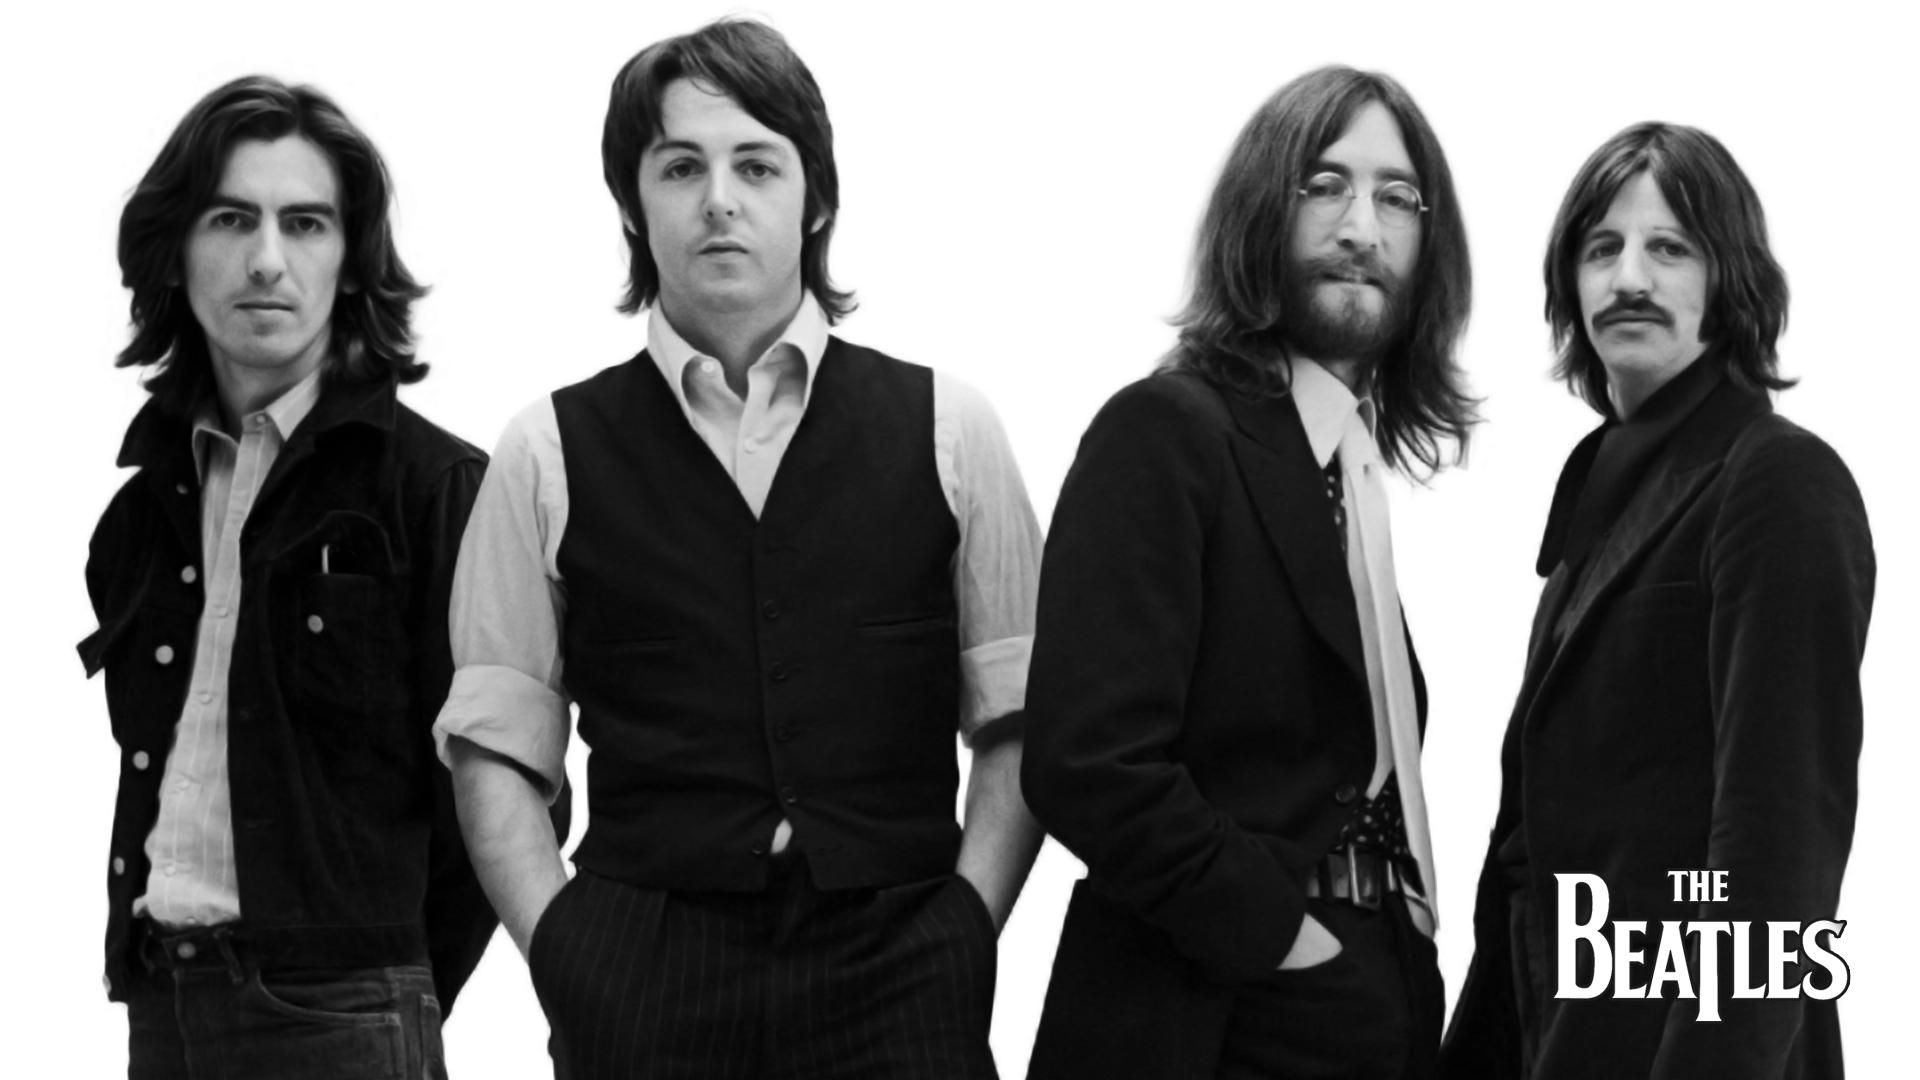 beatles 1969 linda photo banner